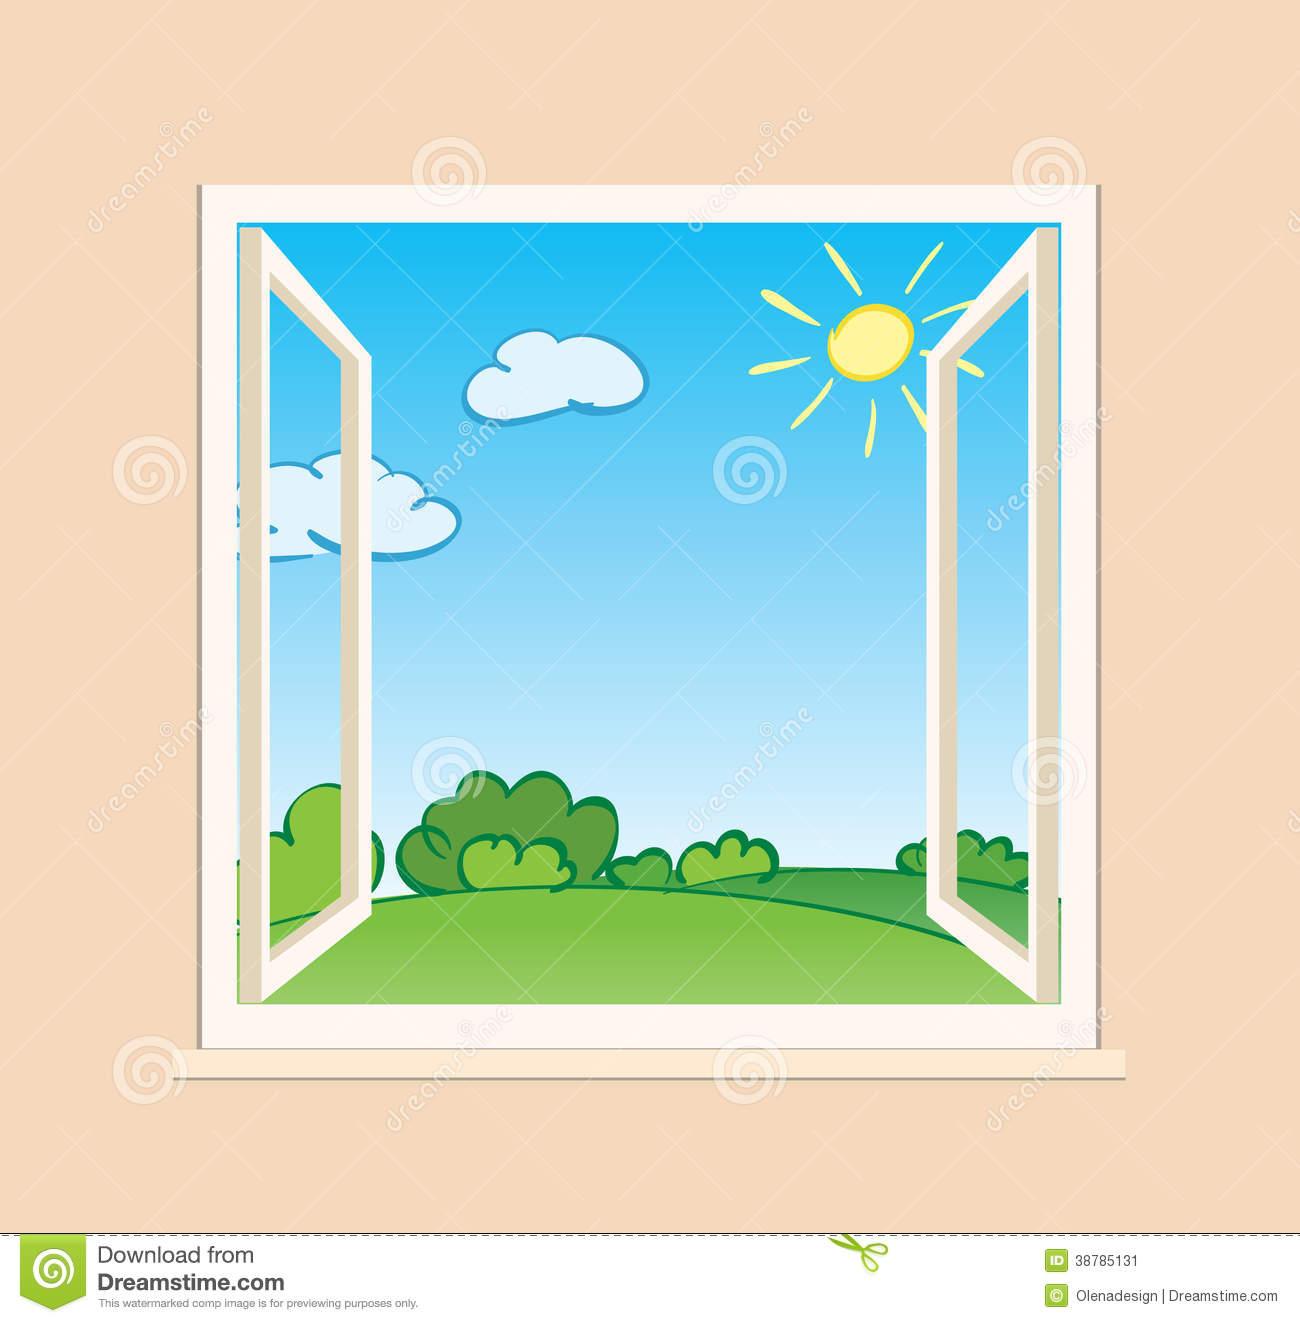 Windows clipart nature.